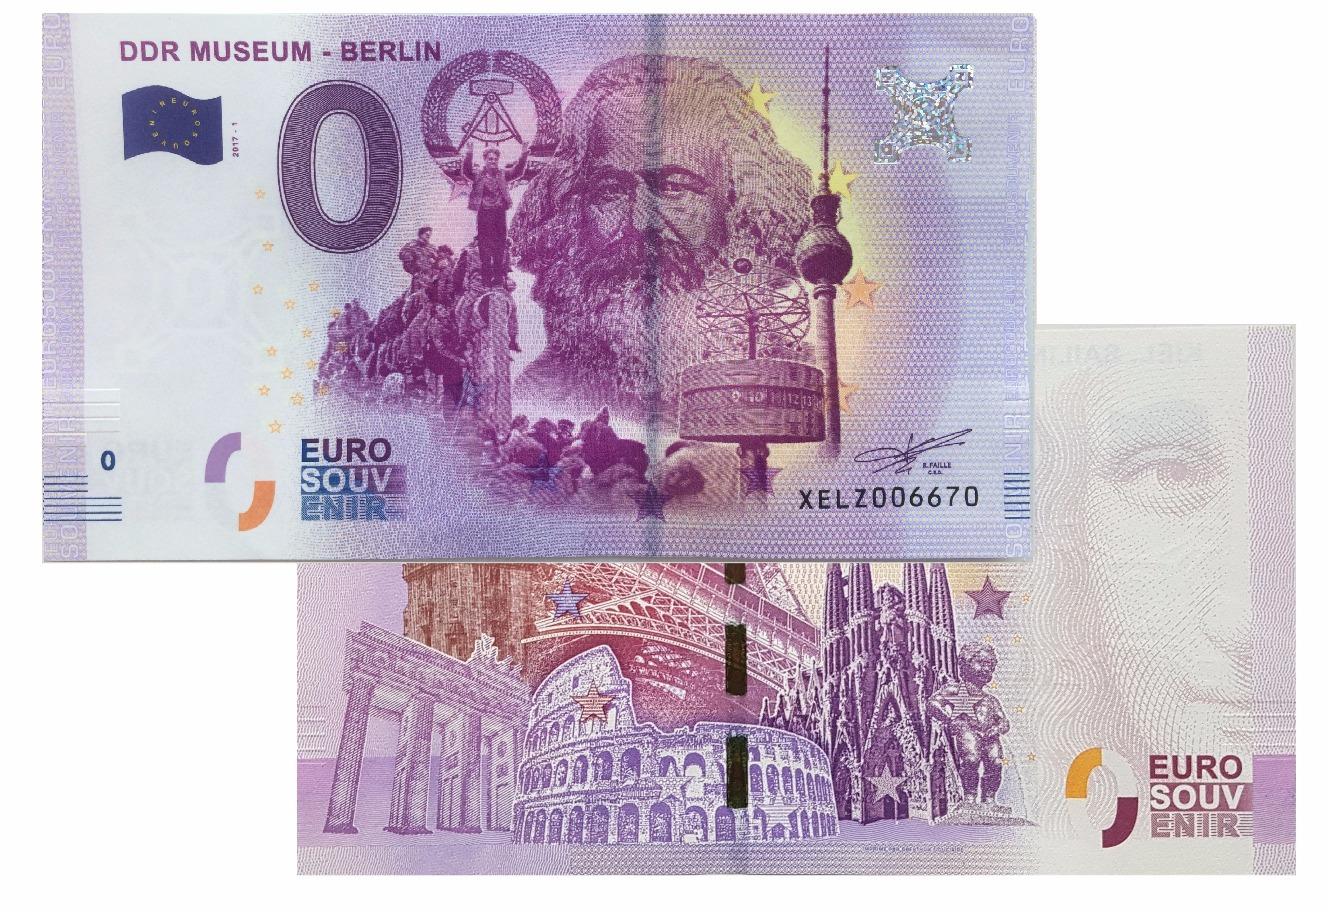 8f028c0fa9f65 DDR Museum 2017-1 (Karl Marx) Zero Euro Souvenir Ticket